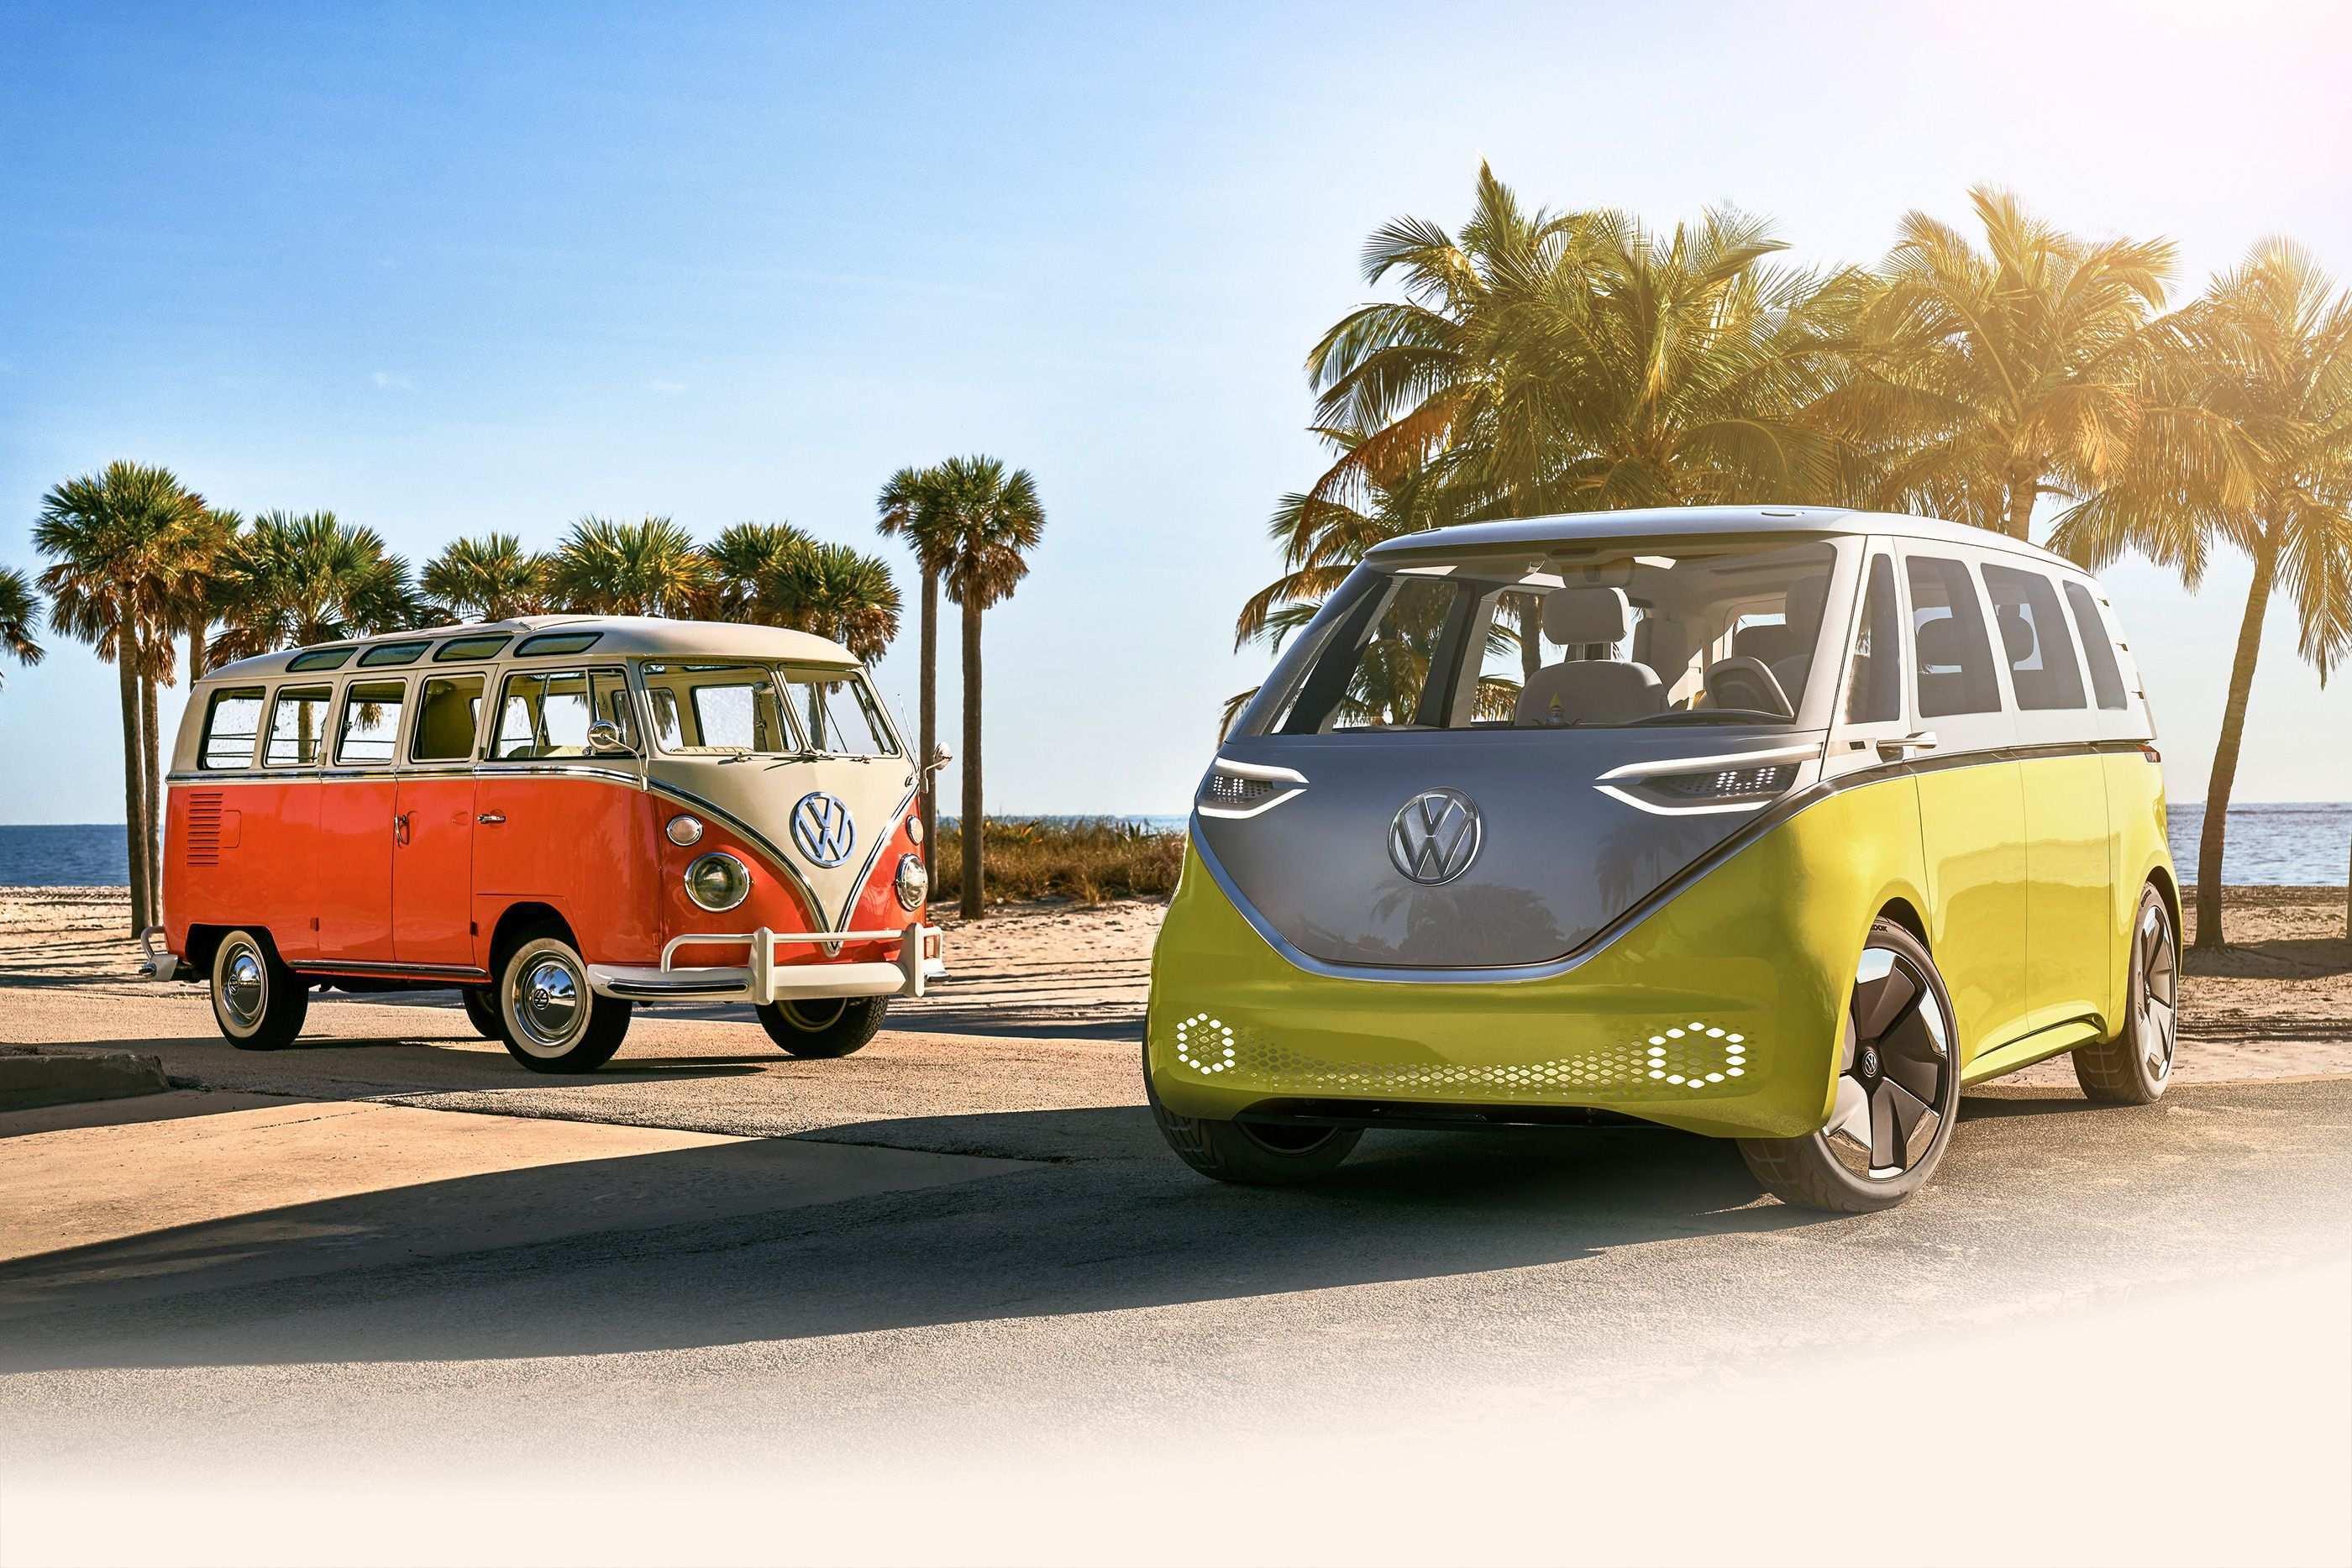 78 Great 2020 Vw Minibus Ratings for 2020 Vw Minibus